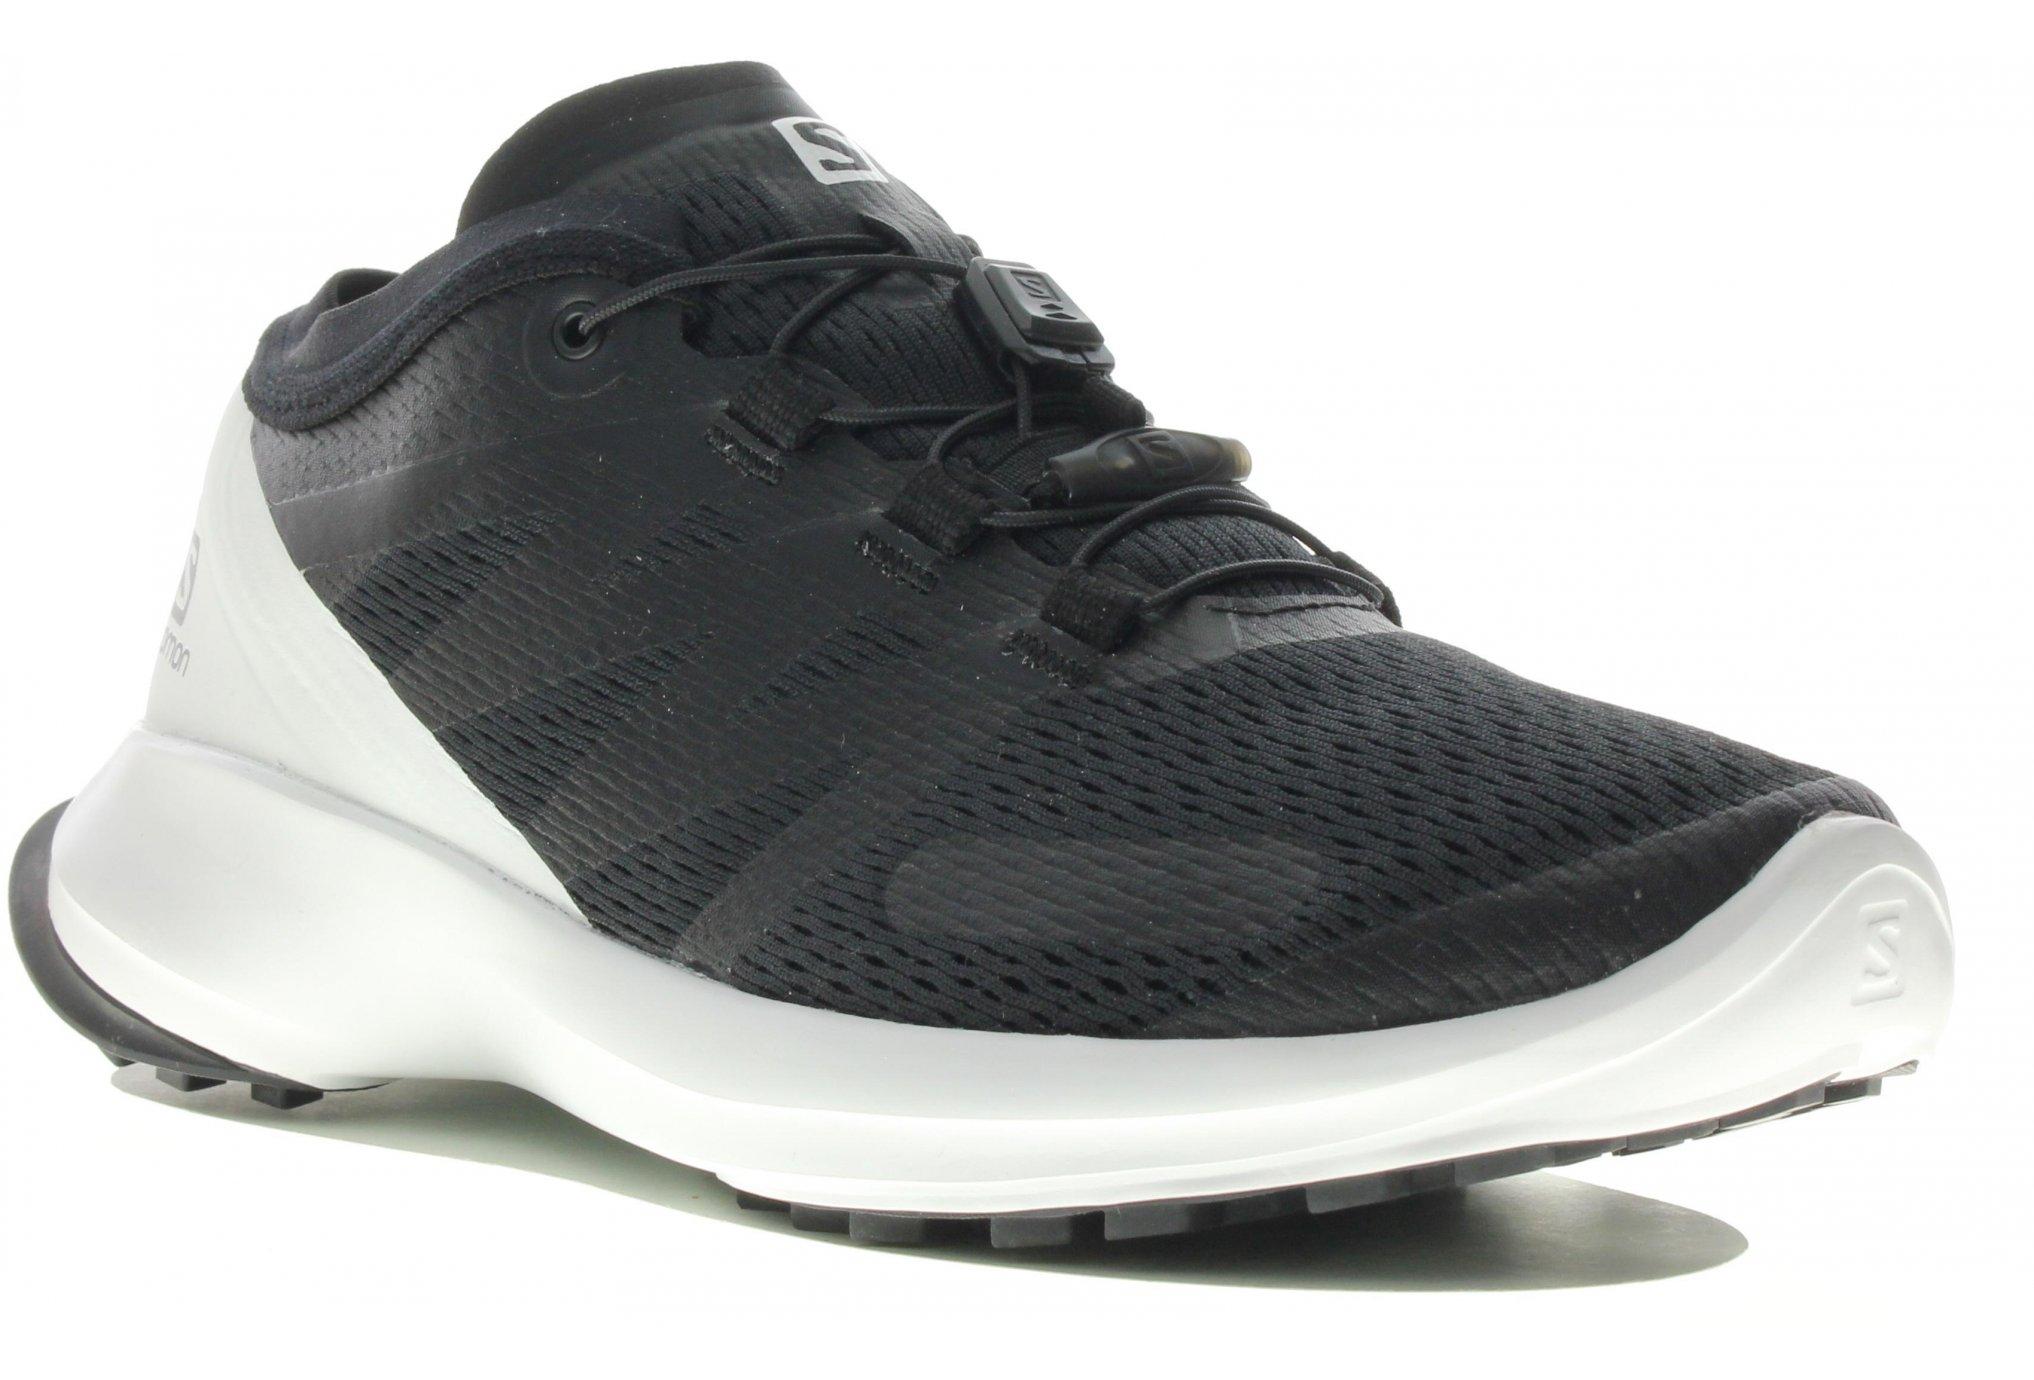 Salomon Sense Flow Chaussures running femme